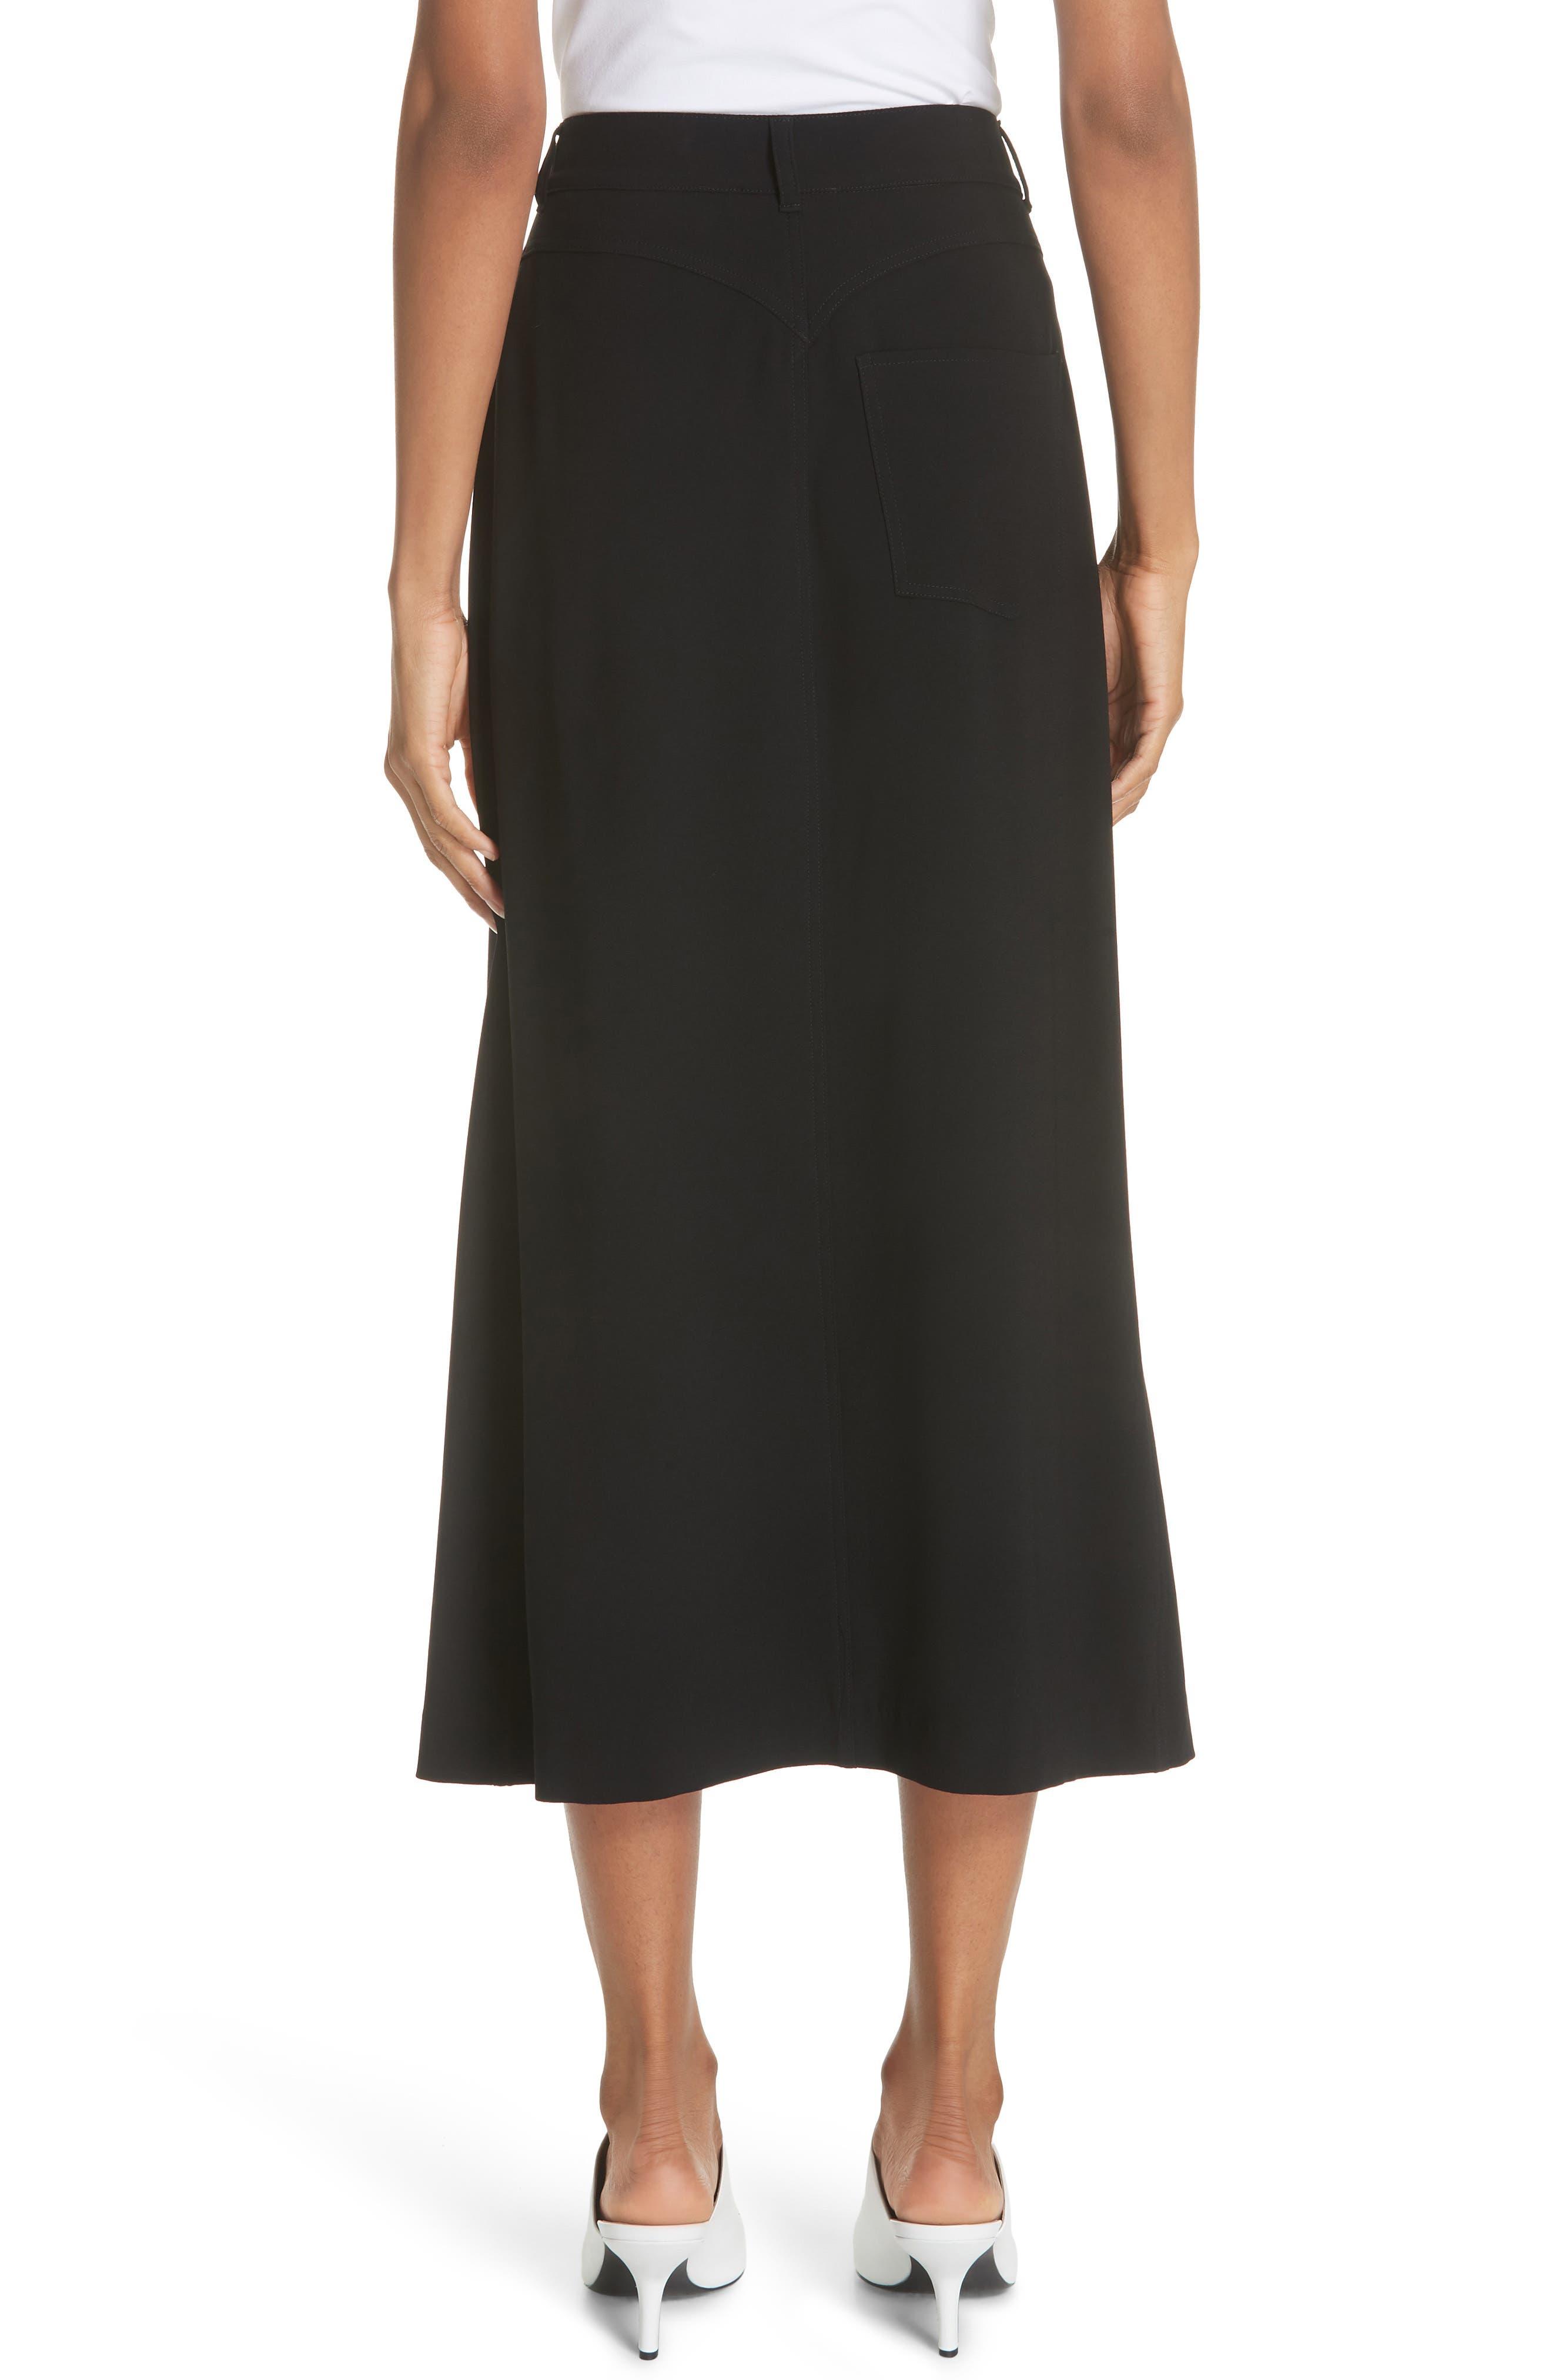 Meida Midi Skirt,                             Alternate thumbnail 2, color,                             003